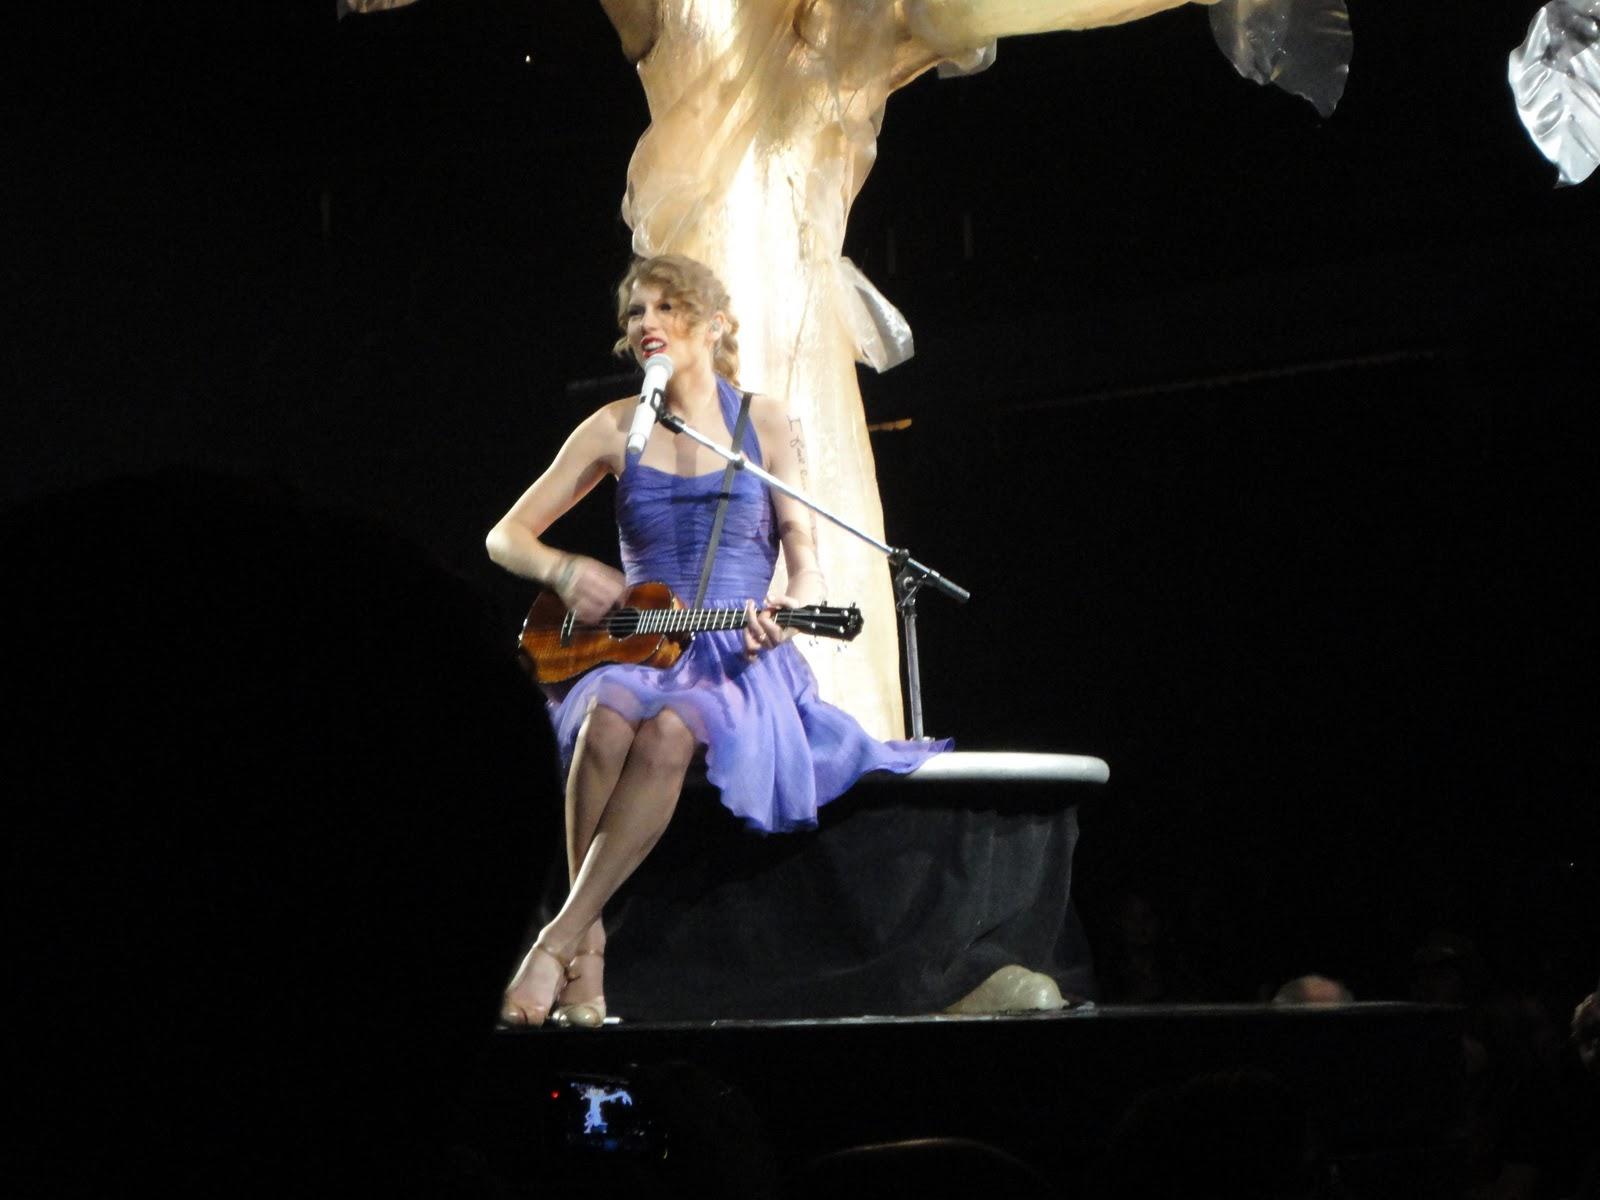 http://4.bp.blogspot.com/-ms8vwHy1b9Y/TsSMybQVsrI/AAAAAAAABP0/ACneTq9PsvA/s1600/Taylor+Swift+Nov.+2011+065.JPG